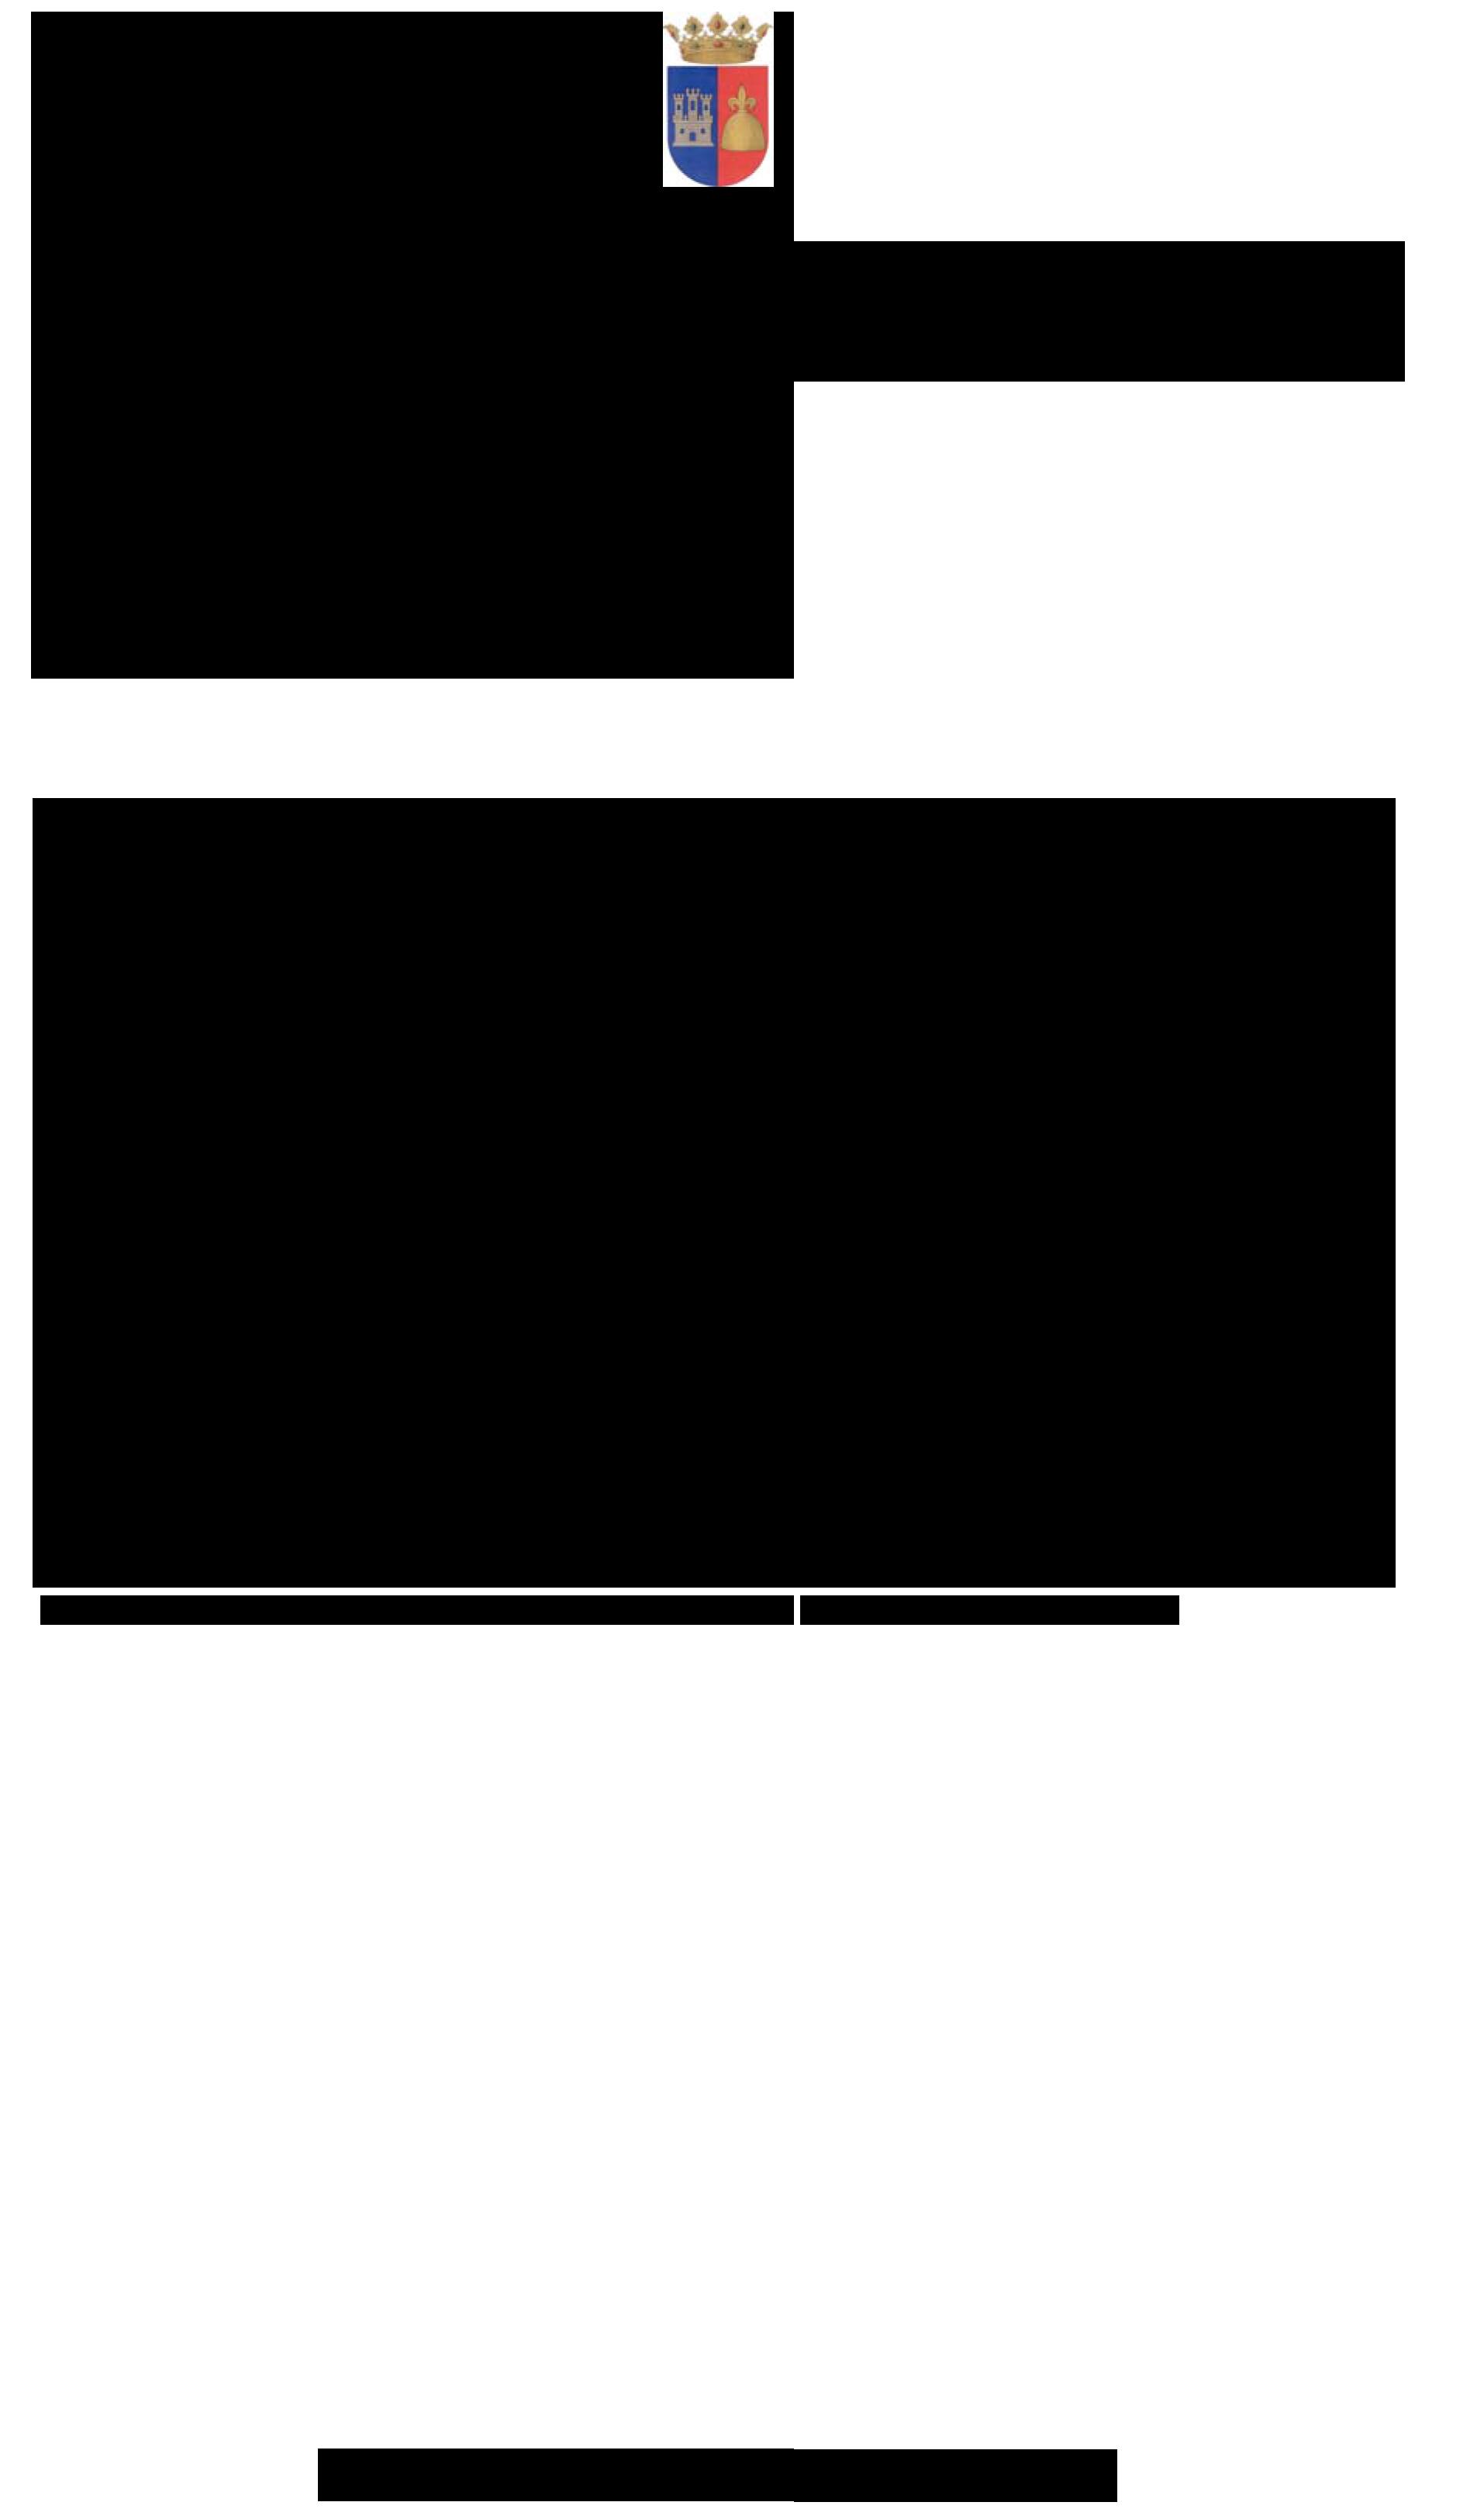 declaracion_responsable_segunda_ocupacion-ESTIVELLA-3